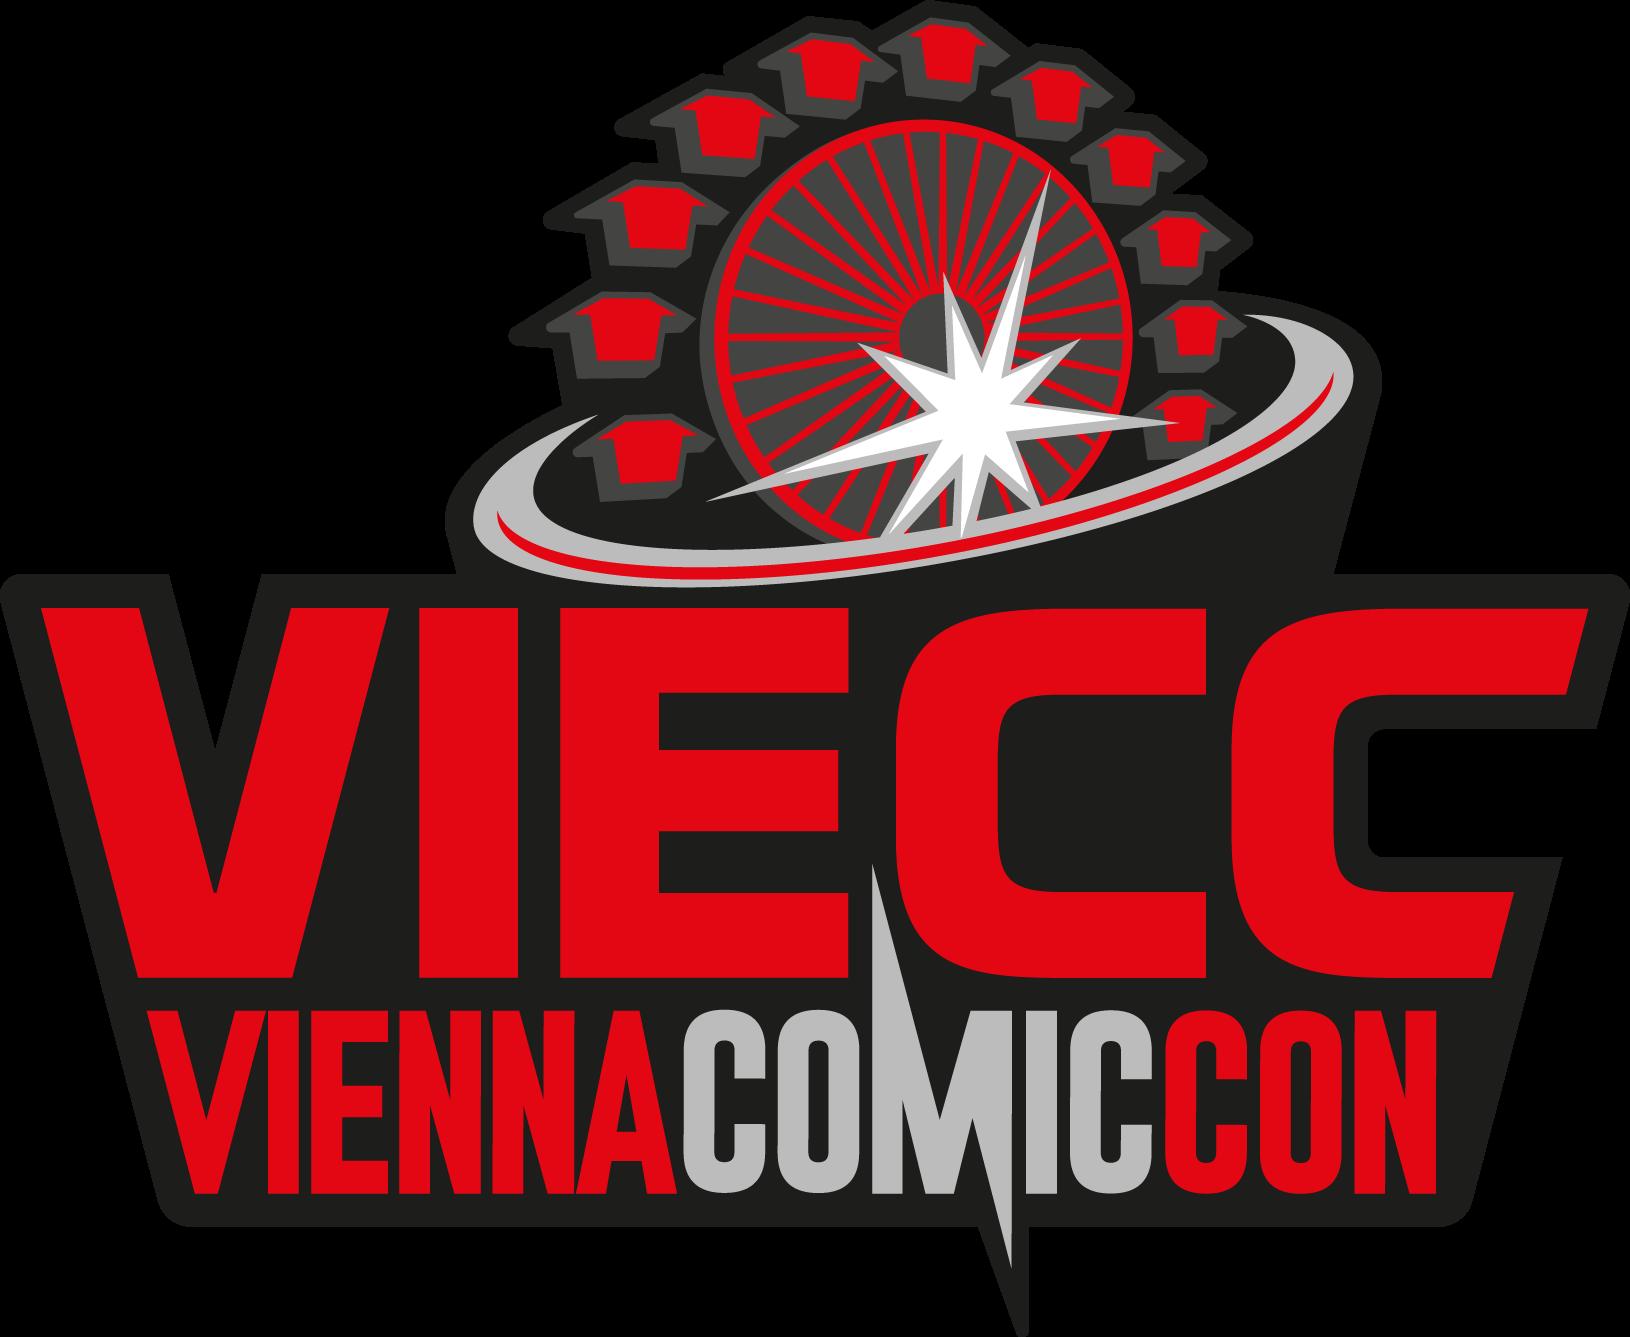 logo_vieccviennacomiccon_png.png